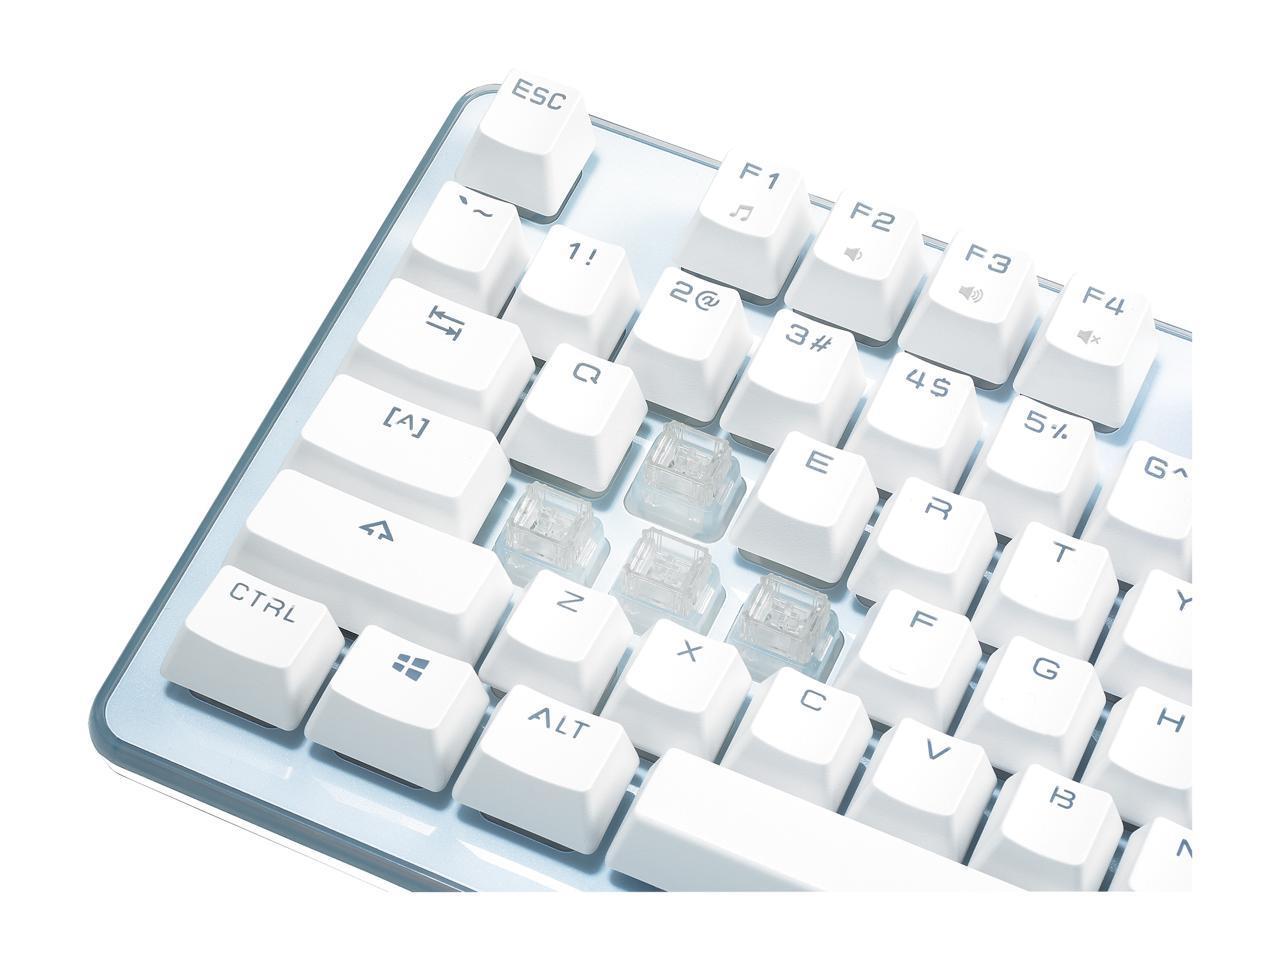 1a57b8b818e Rosewill NEON K51 - Hybrid Mechanical RGB Gaming Keyboard / Multicolor  Backlit K